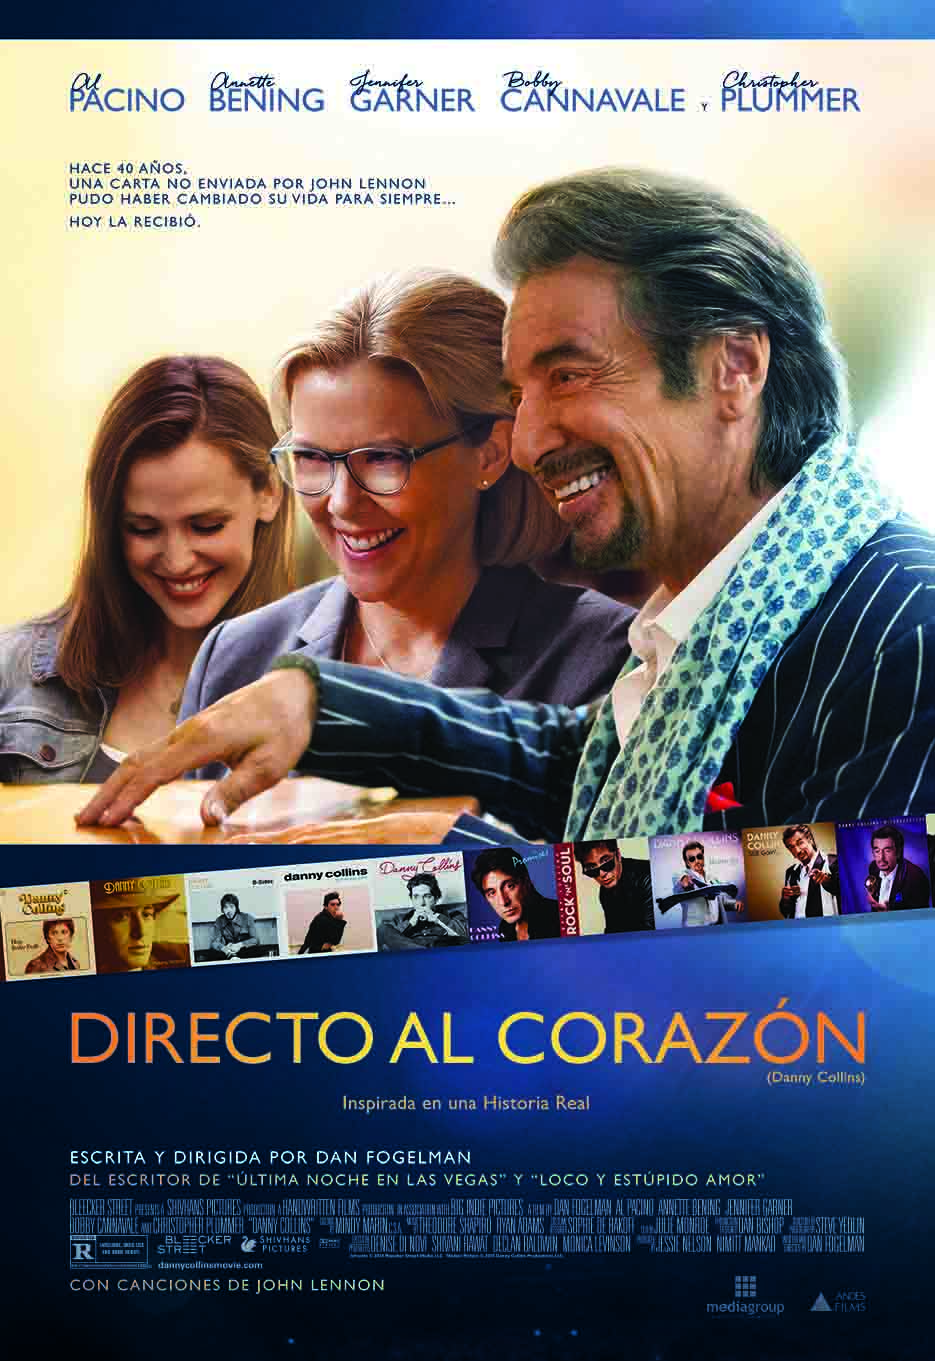 http://www.andesfilms.com.pe/directo-al-corazon/